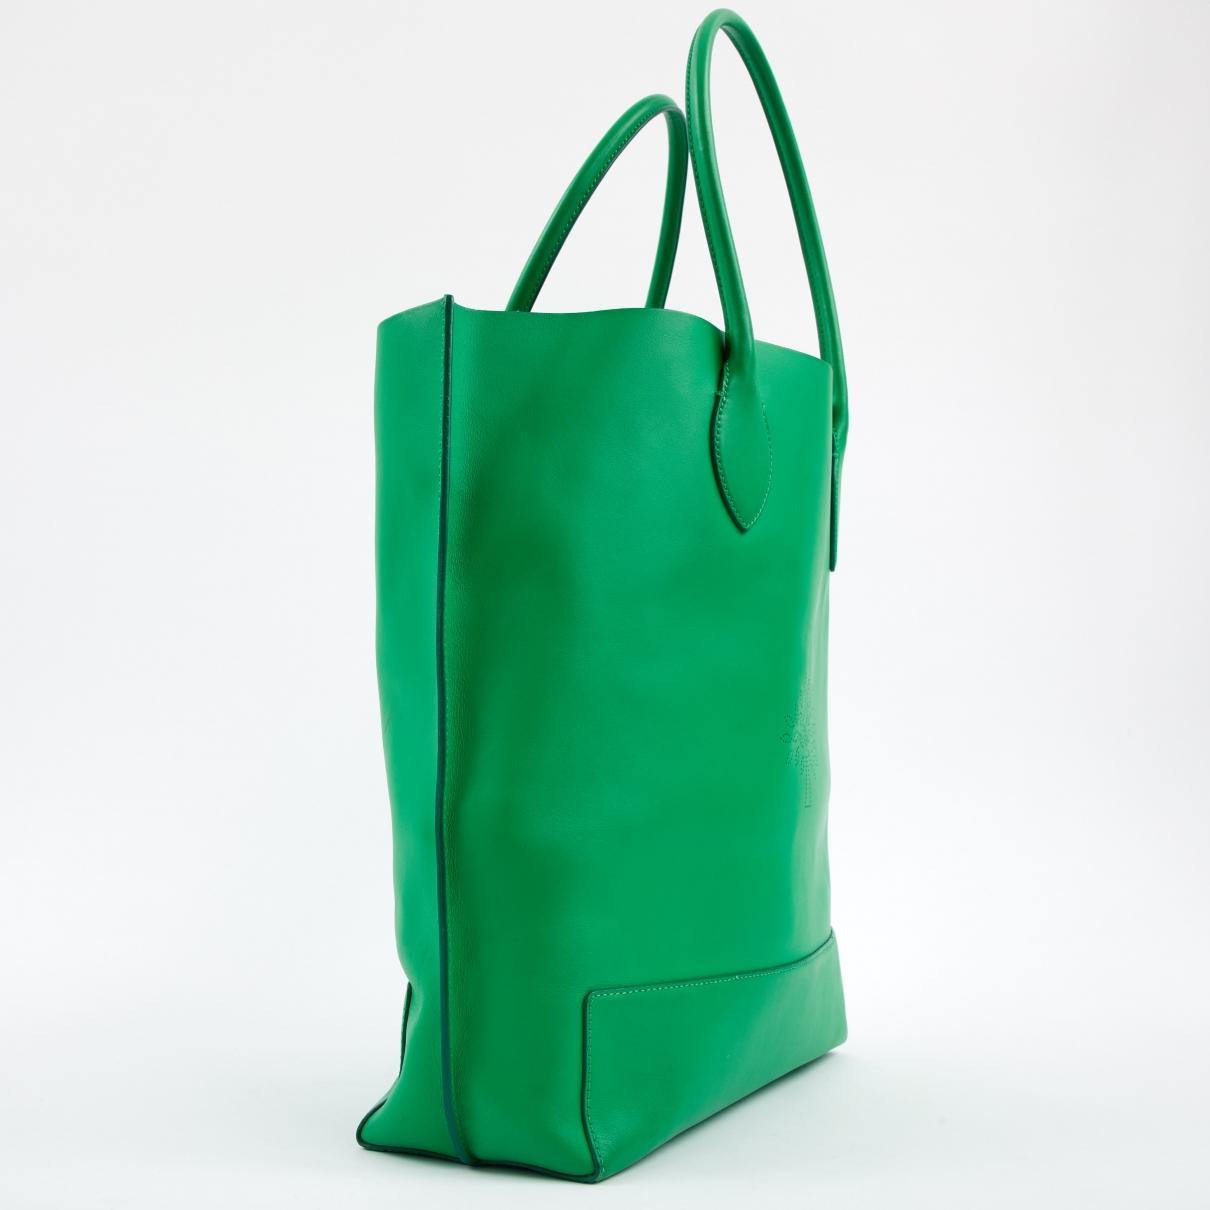 0115fdd4cb19 Mulberry - Green Leather Handbag - Lyst. View fullscreen